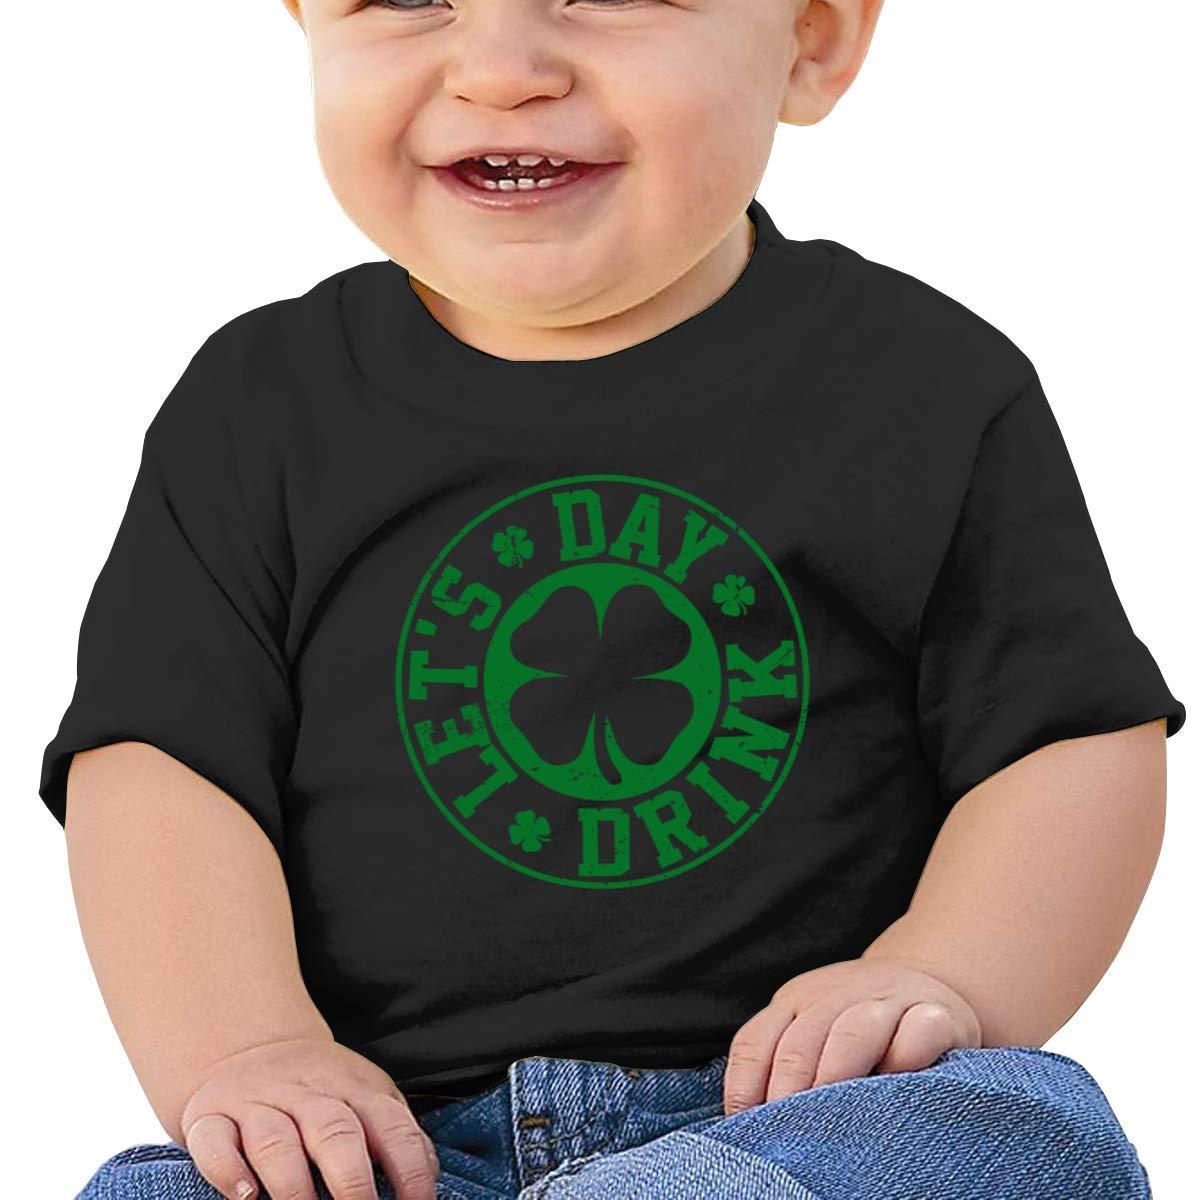 SCOTT CARROLL Lets Day Drink Short-Sleeves Tshirt Baby Girl